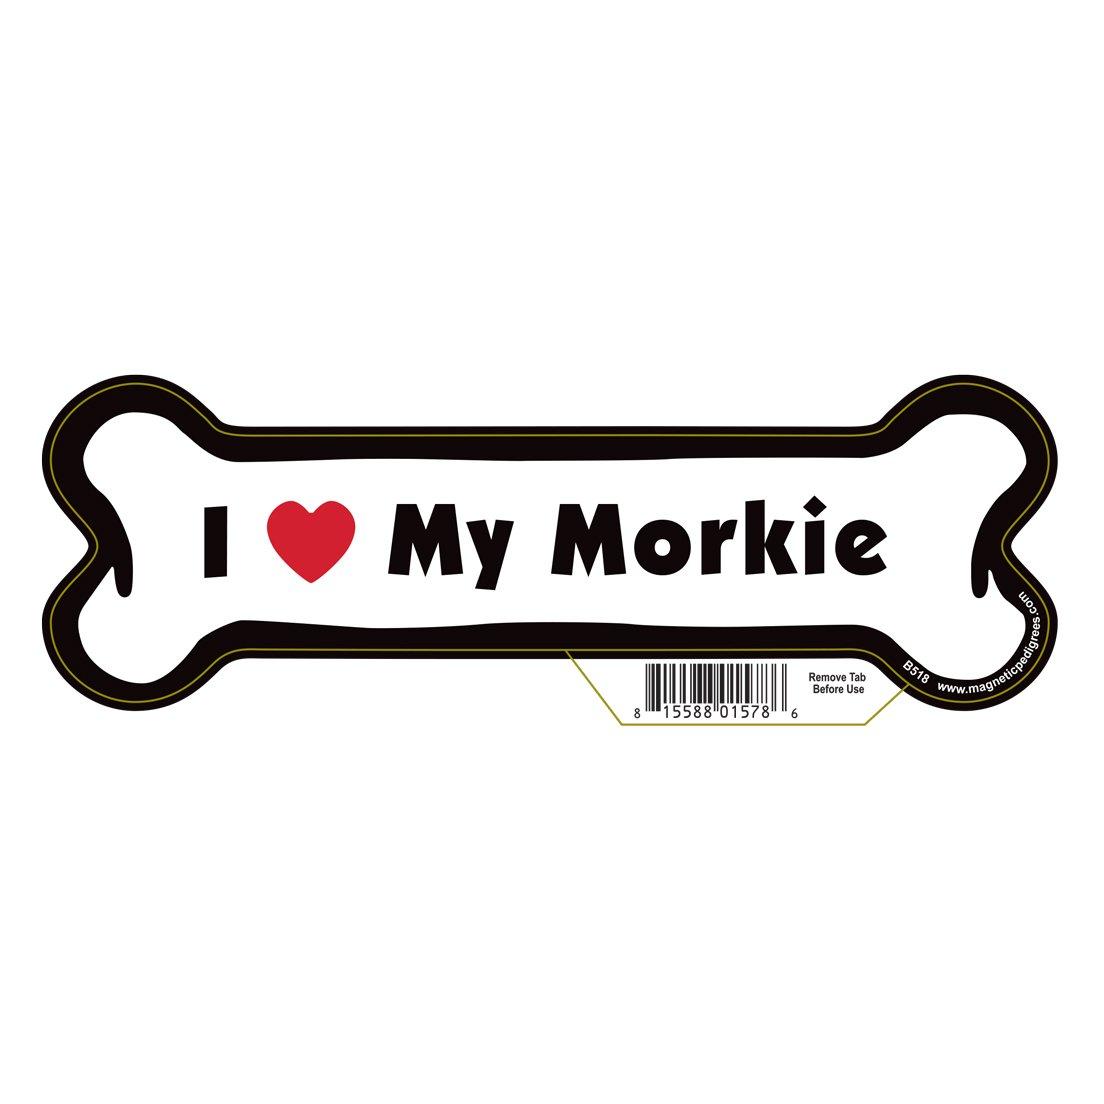 Morkie Dog Bone Magnet